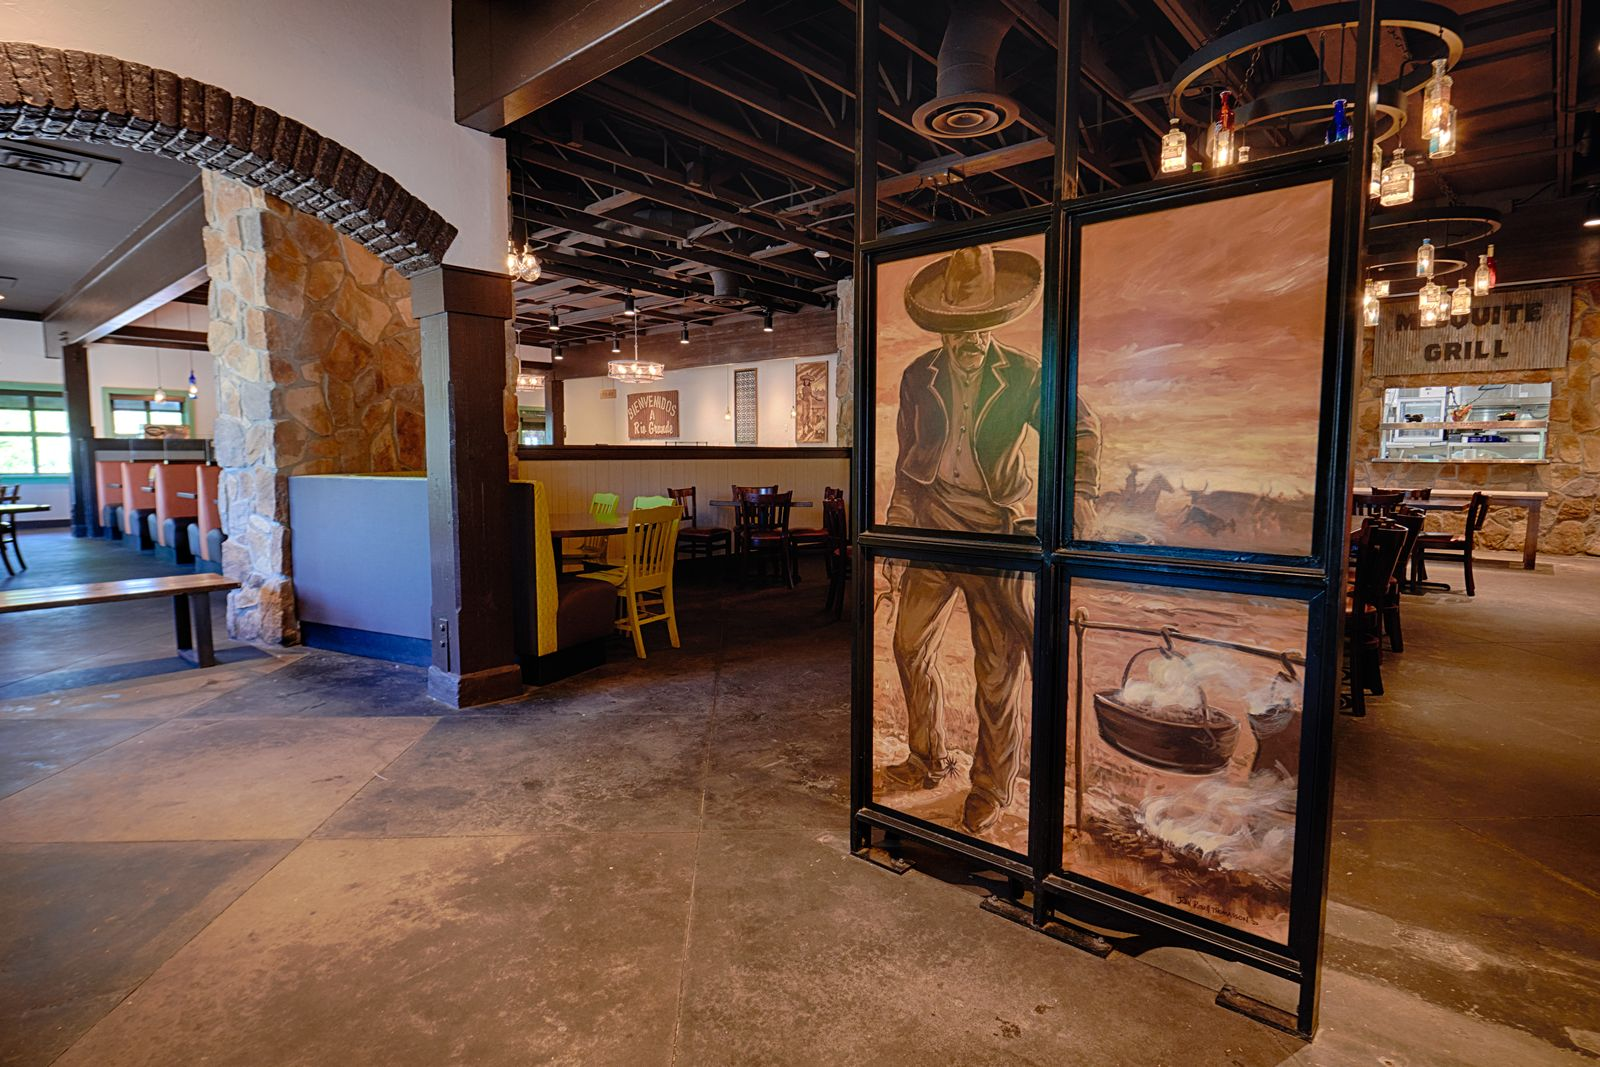 On The Border Debuts All-New Nostalgic Prototype at Alpharetta Restaurant